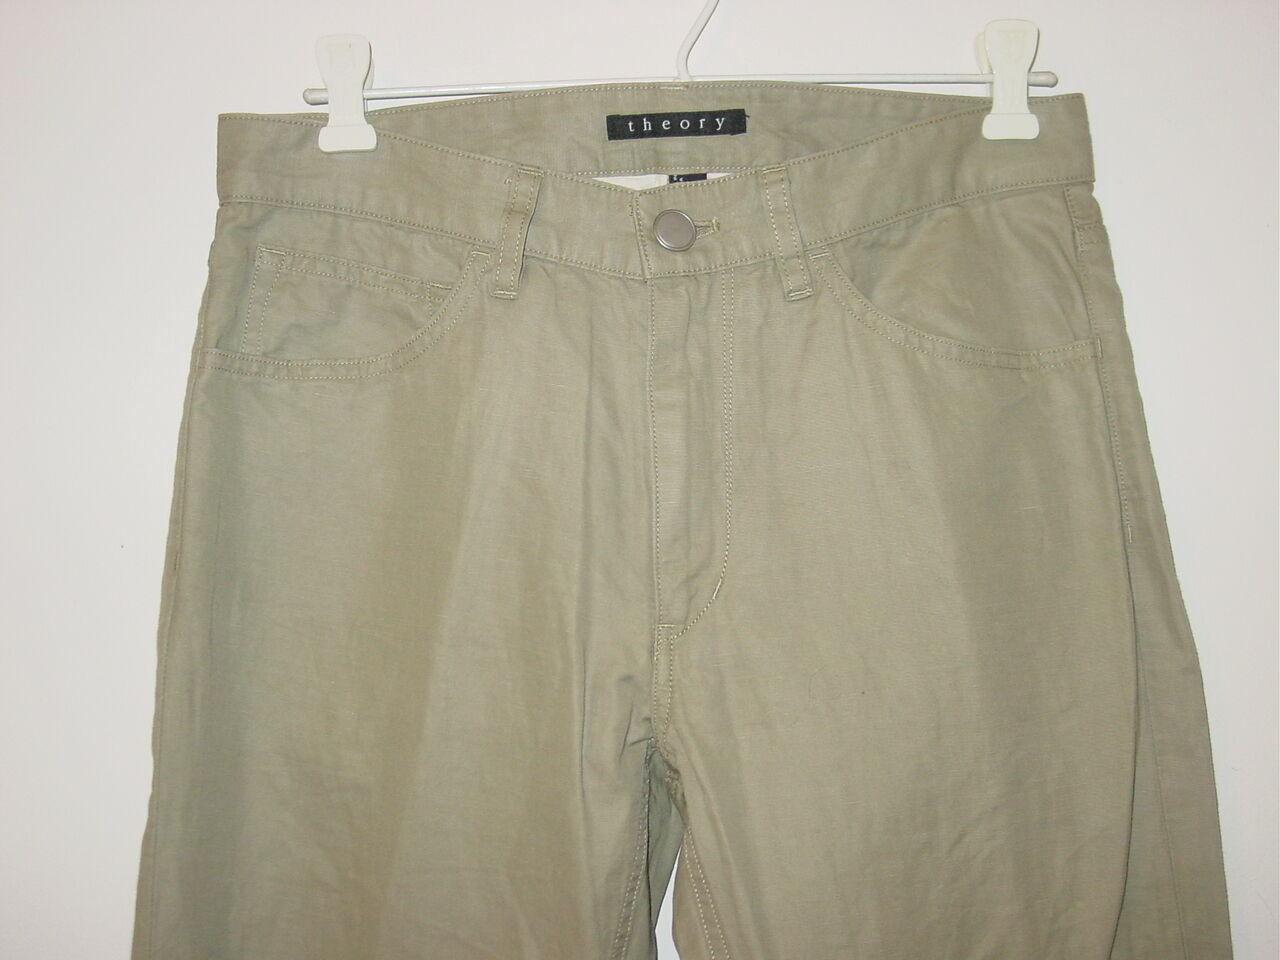 Theory Women's tan khaki light army green pants cotton linen blend-28-NEW